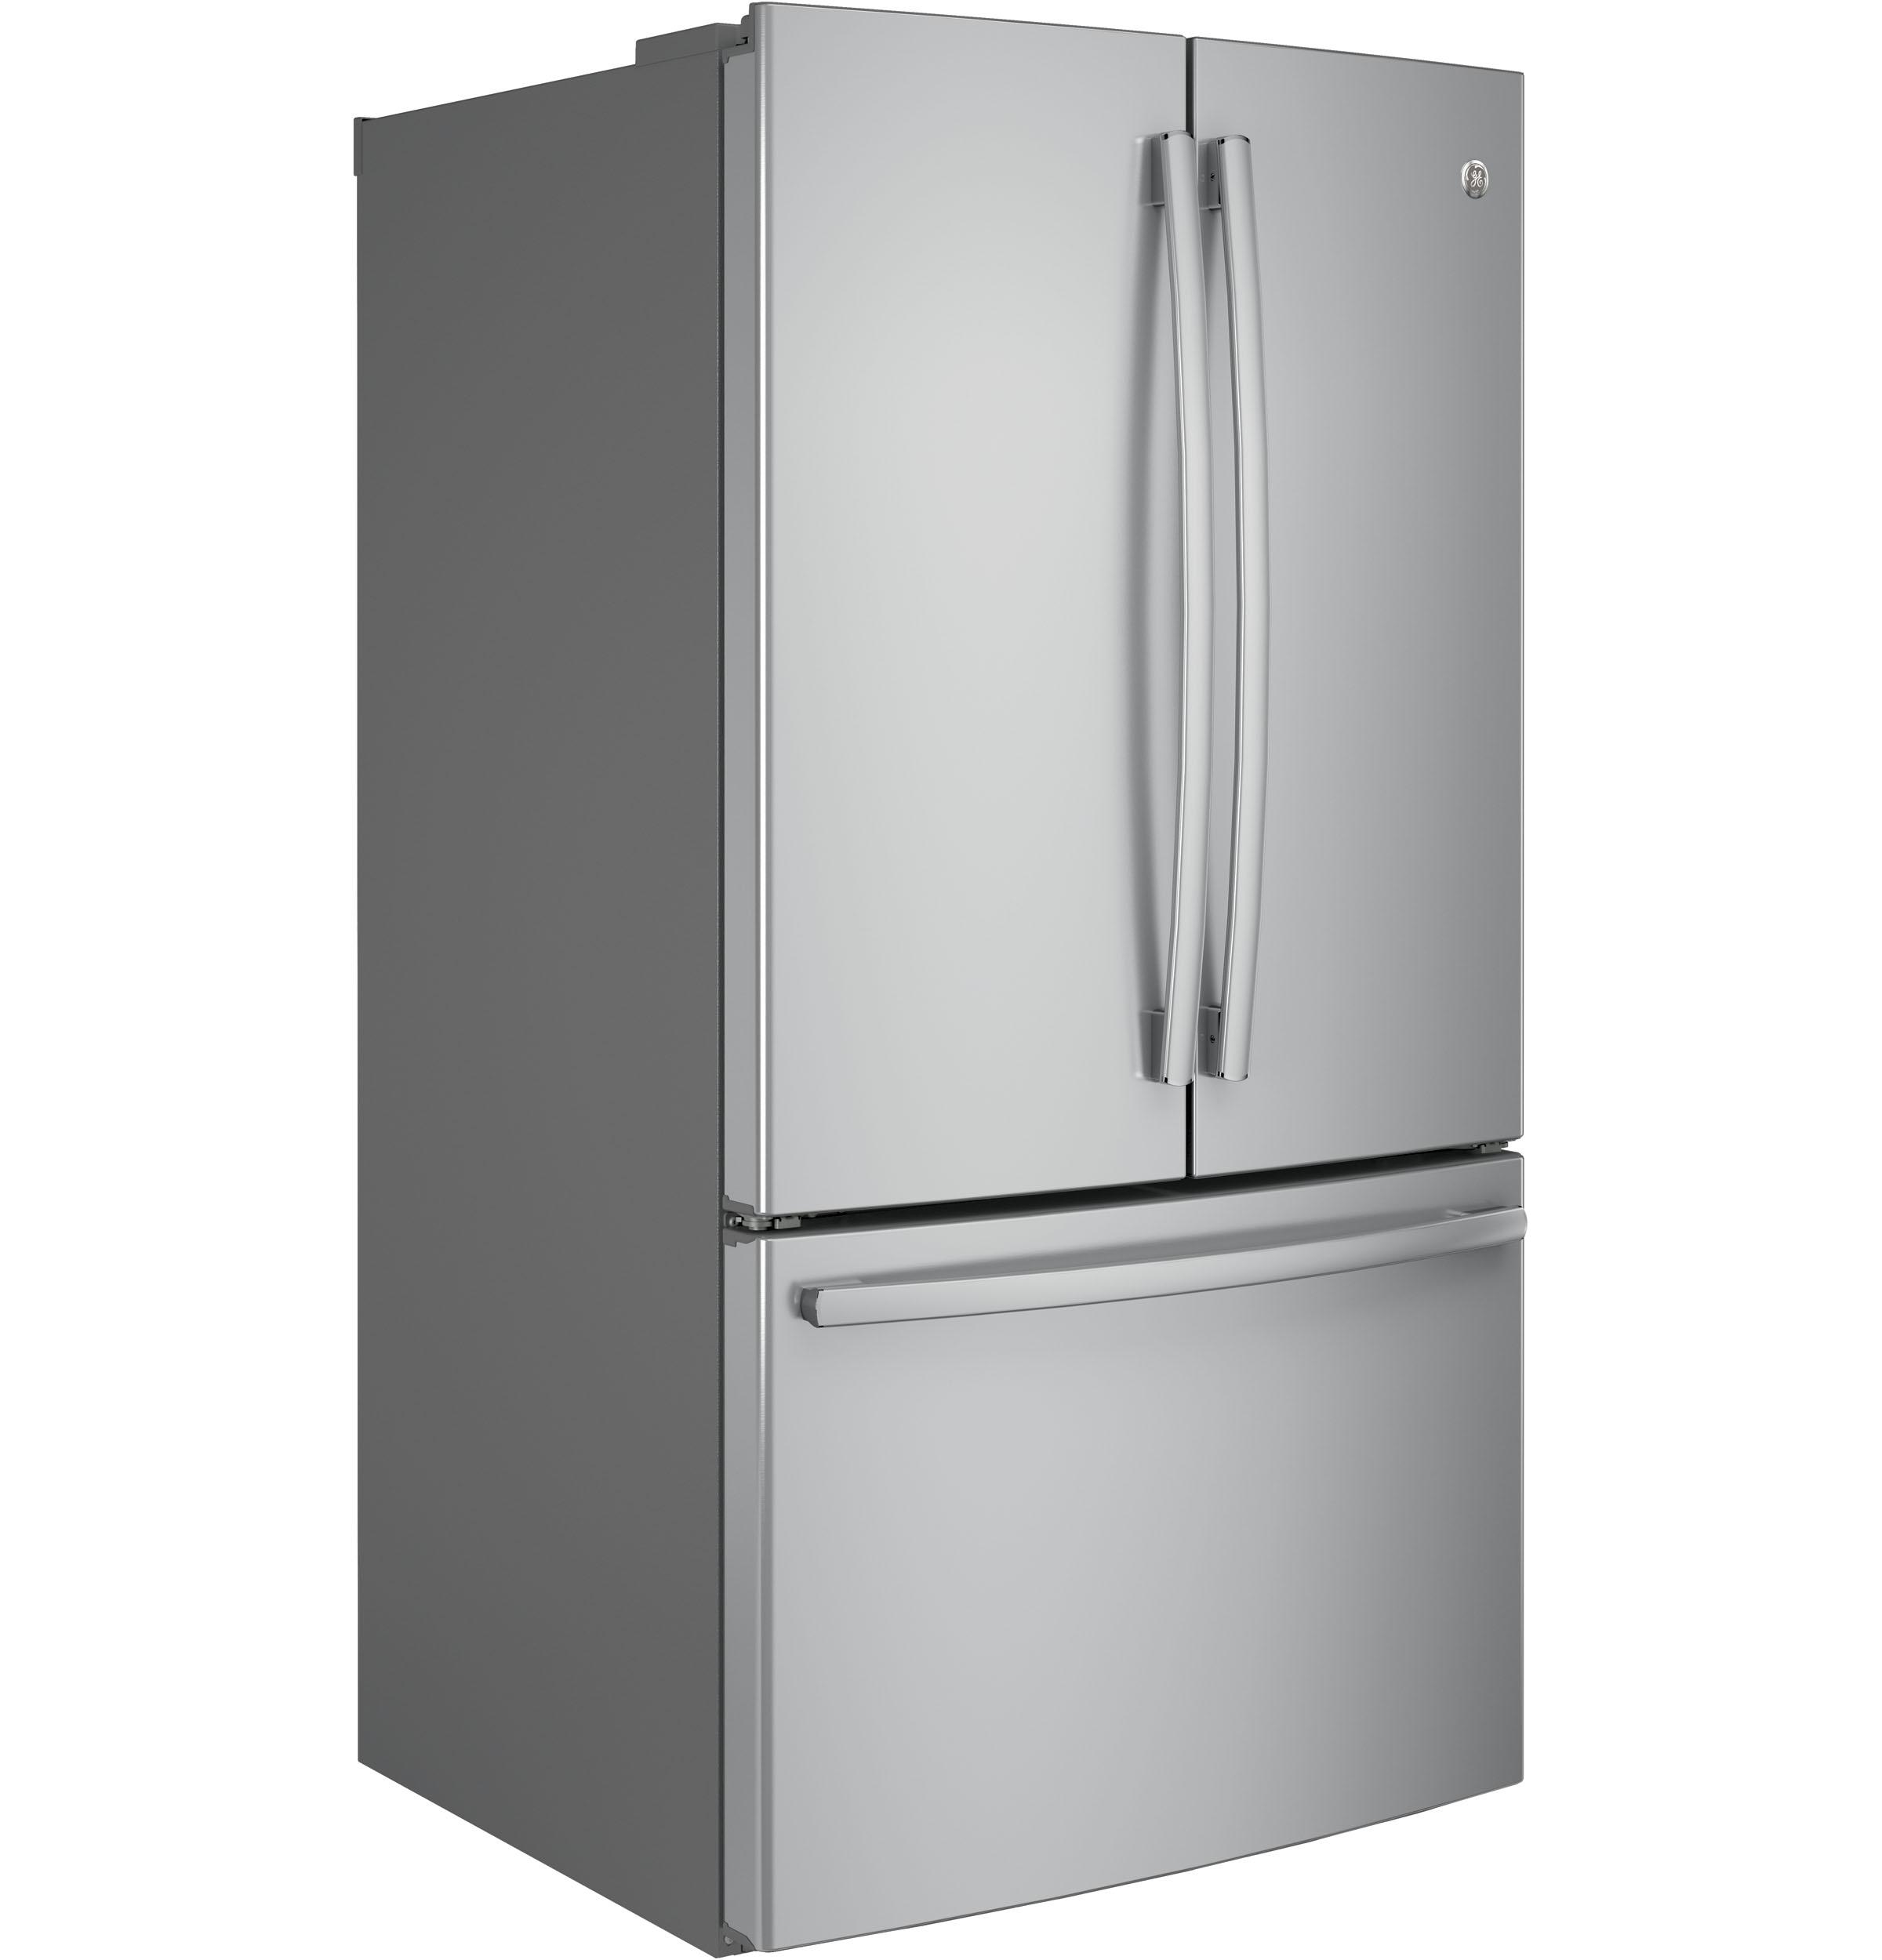 Model: GNE29GSKSS   GE® ENERGY STAR® 28.7 Cu. Ft. French-Door Refrigerator